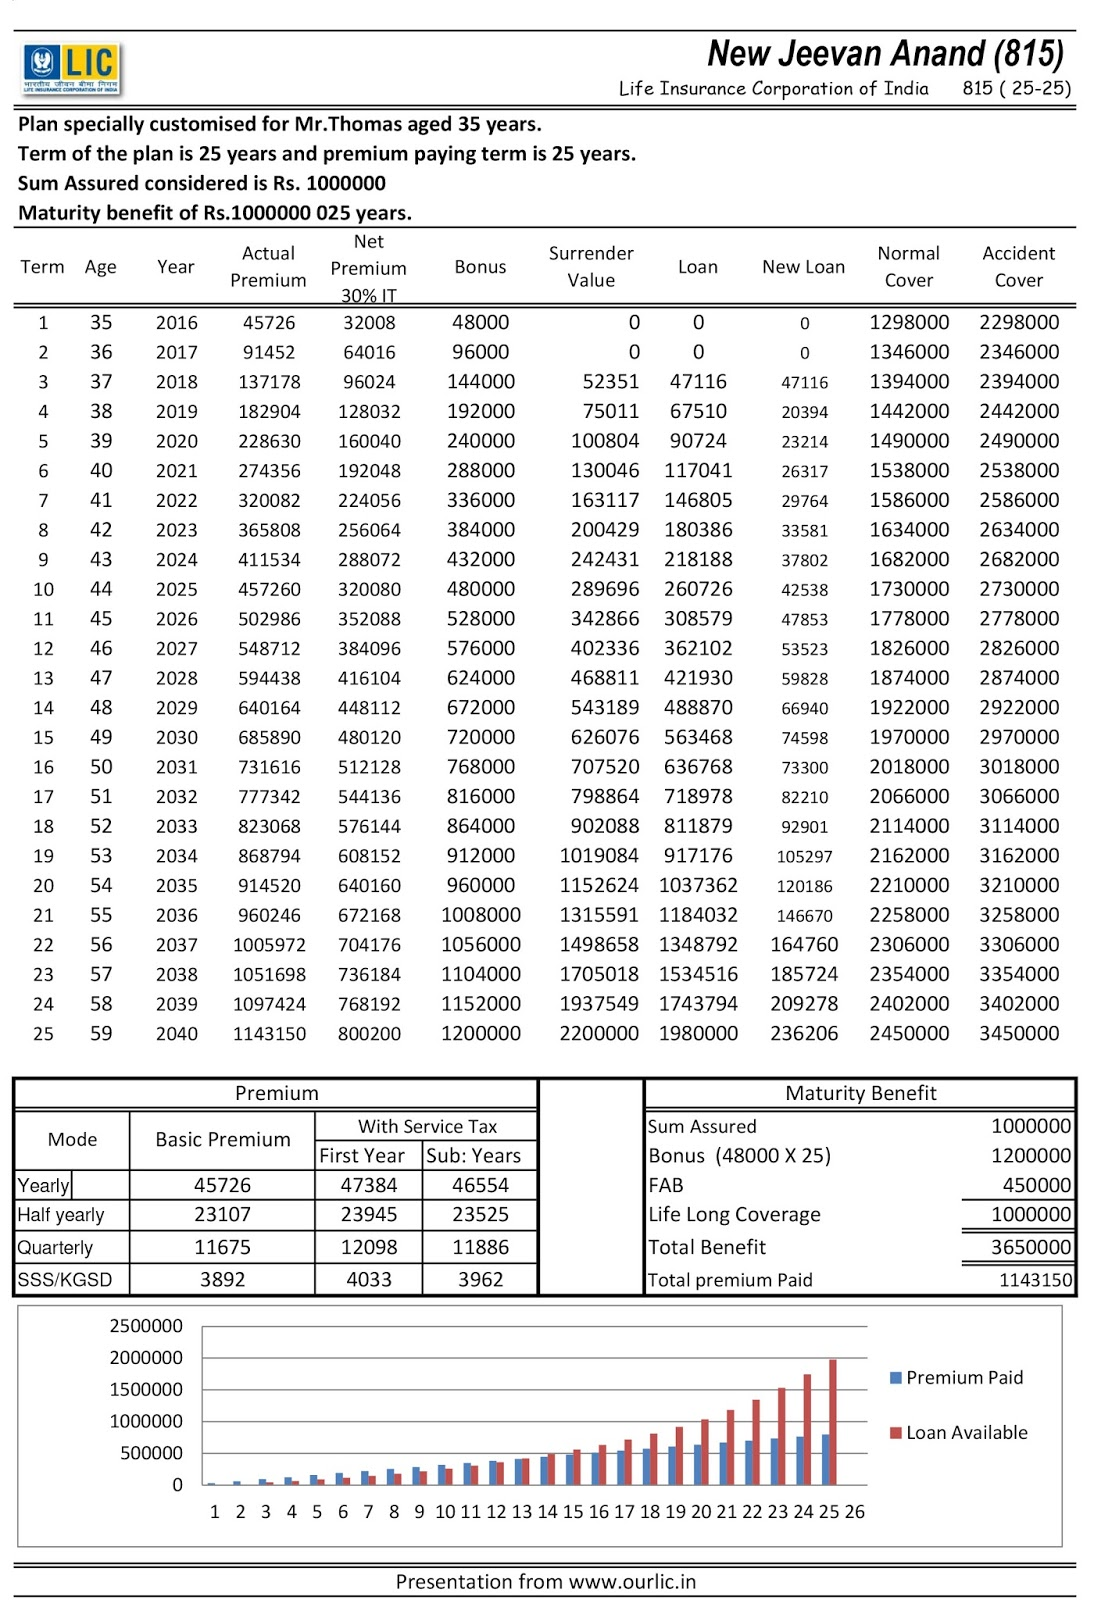 lic jeevan anand premium calculator pdf